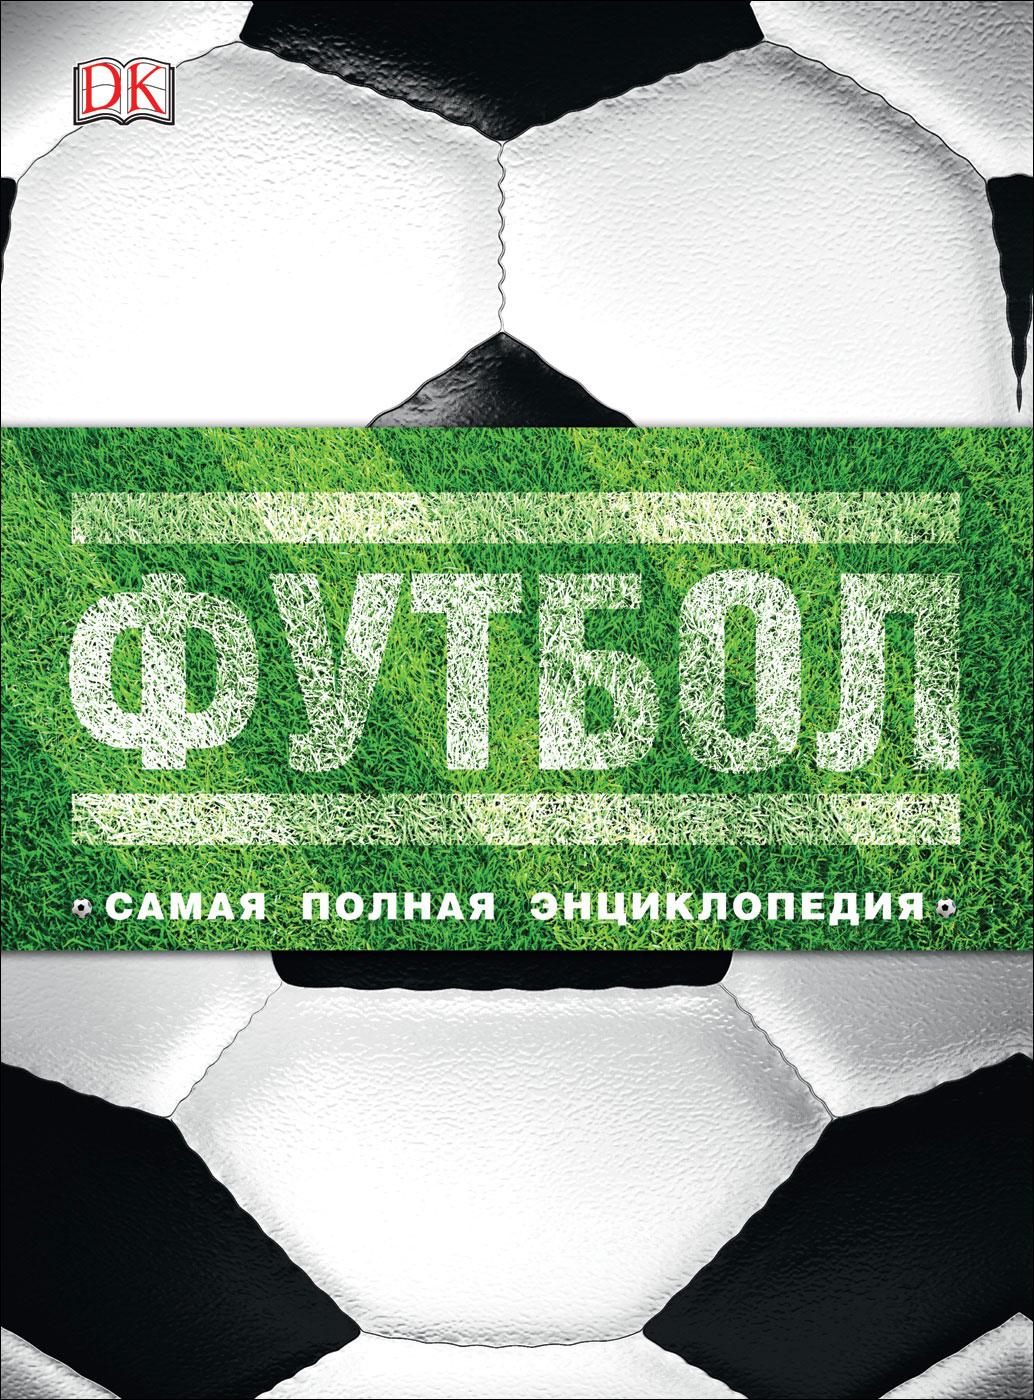 Goldblatt D. Futbol. Samaja polnaja entsiklopedija (DK). Novoe izdanie